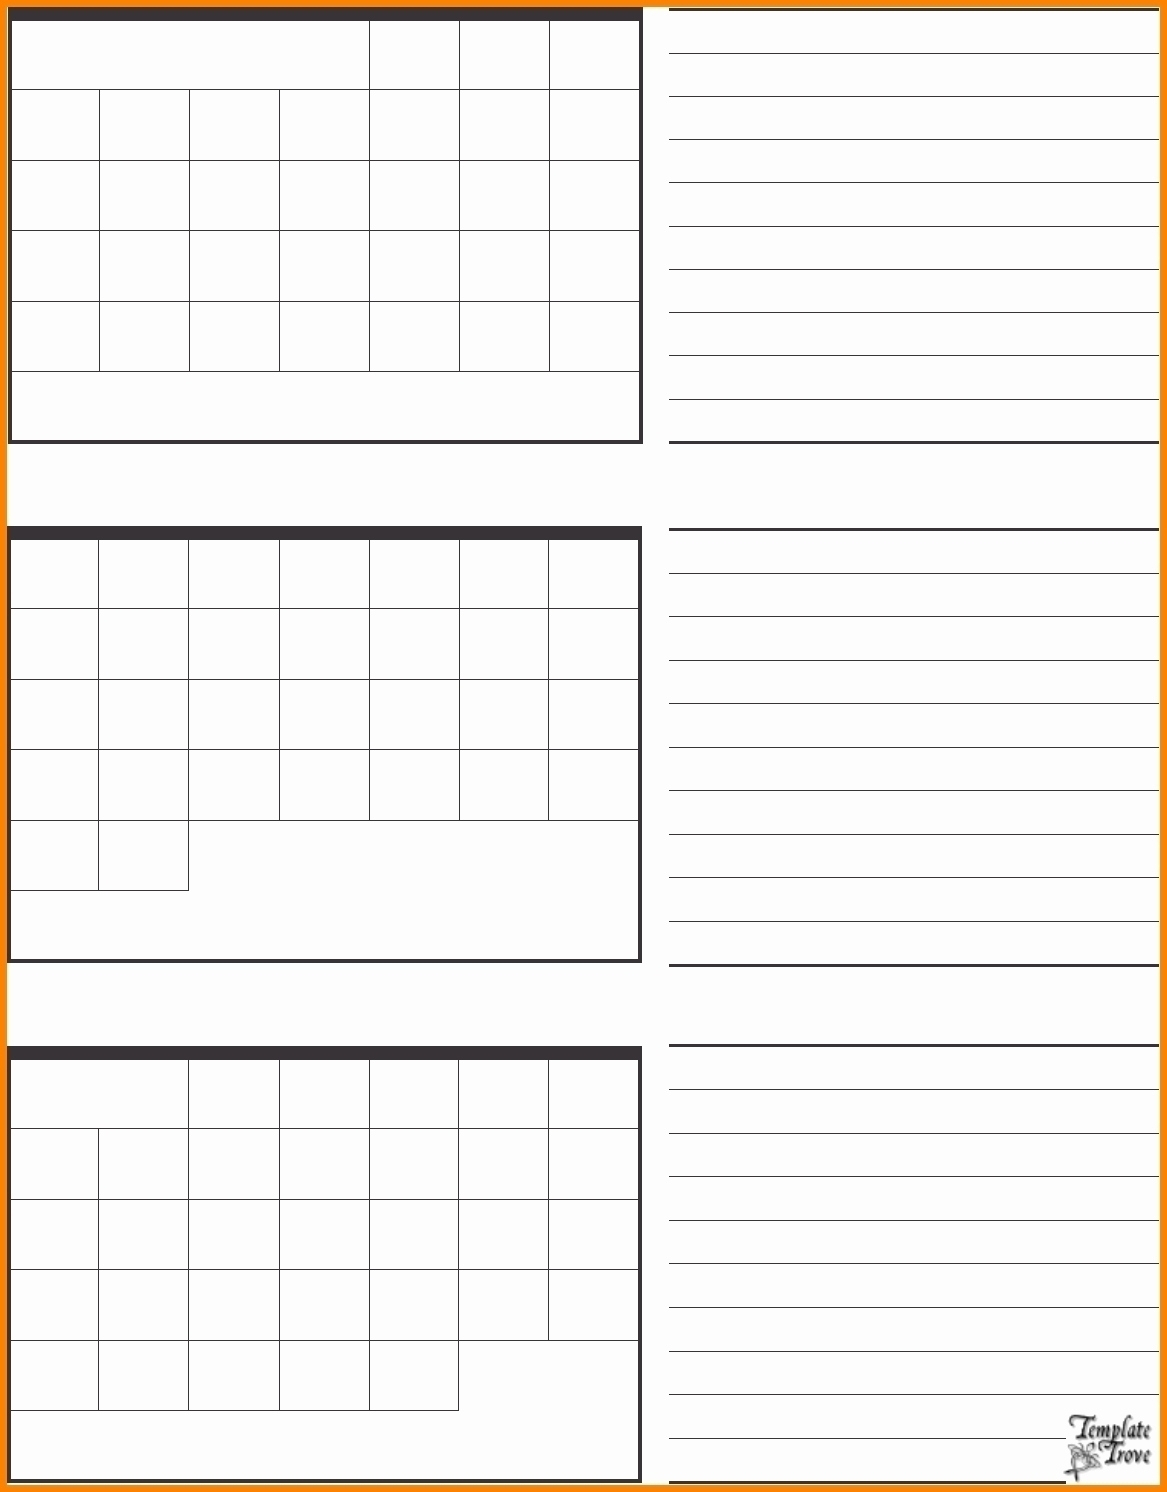 3 Month Blank Printable Calendar | Example Calendar with Printable Calendar 3 Month